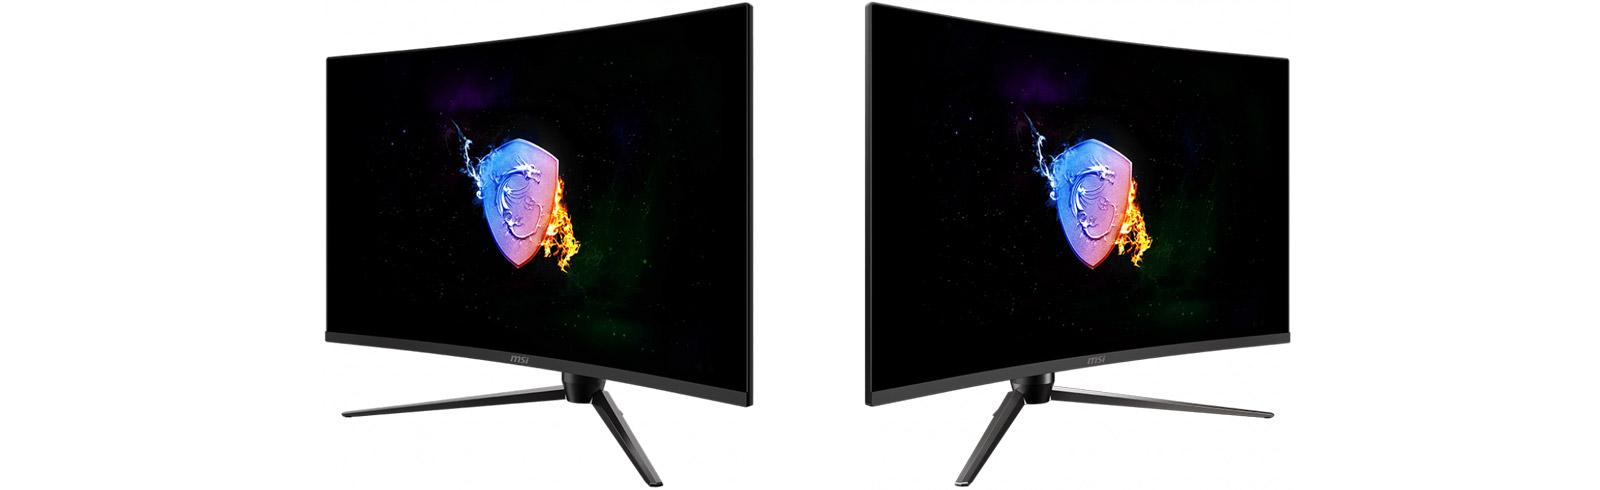 MSI Optix AG321CQR and Optix AG321CR go official with 165Hz VA displays